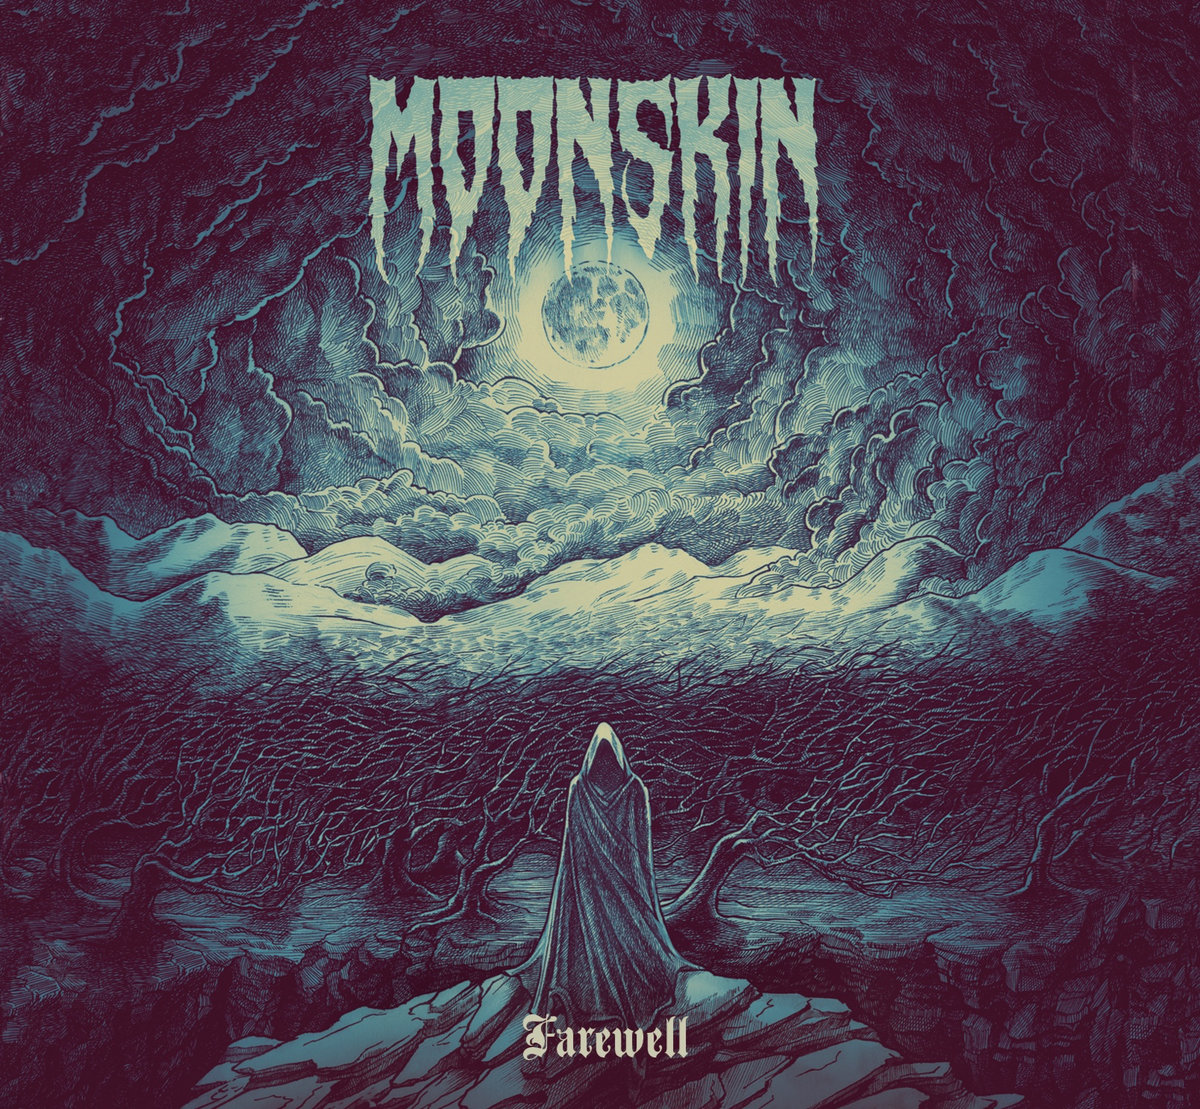 Moonskin - Farewell